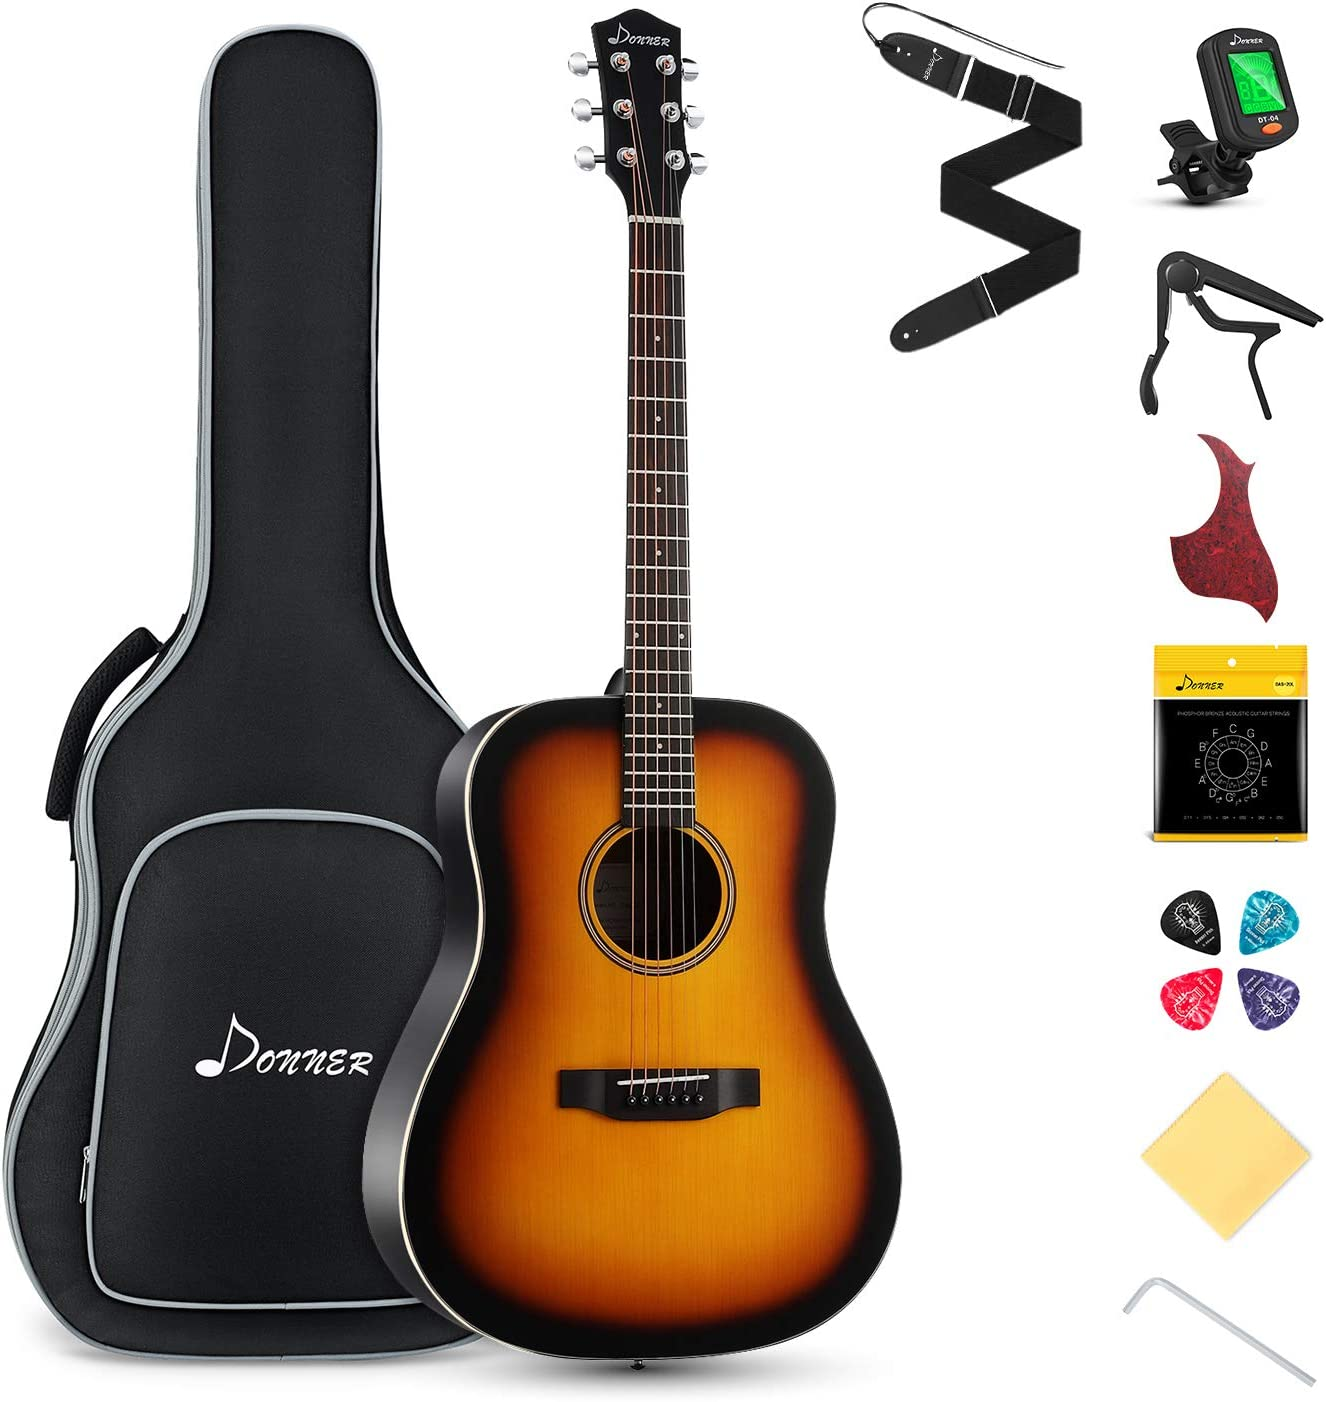 Donner Guitarra Acústica Dreadnought con 41 Pulgadas Cuerpo de Caoba y Pícea con Set de Accesorios (Sunburst, DAG-1S)